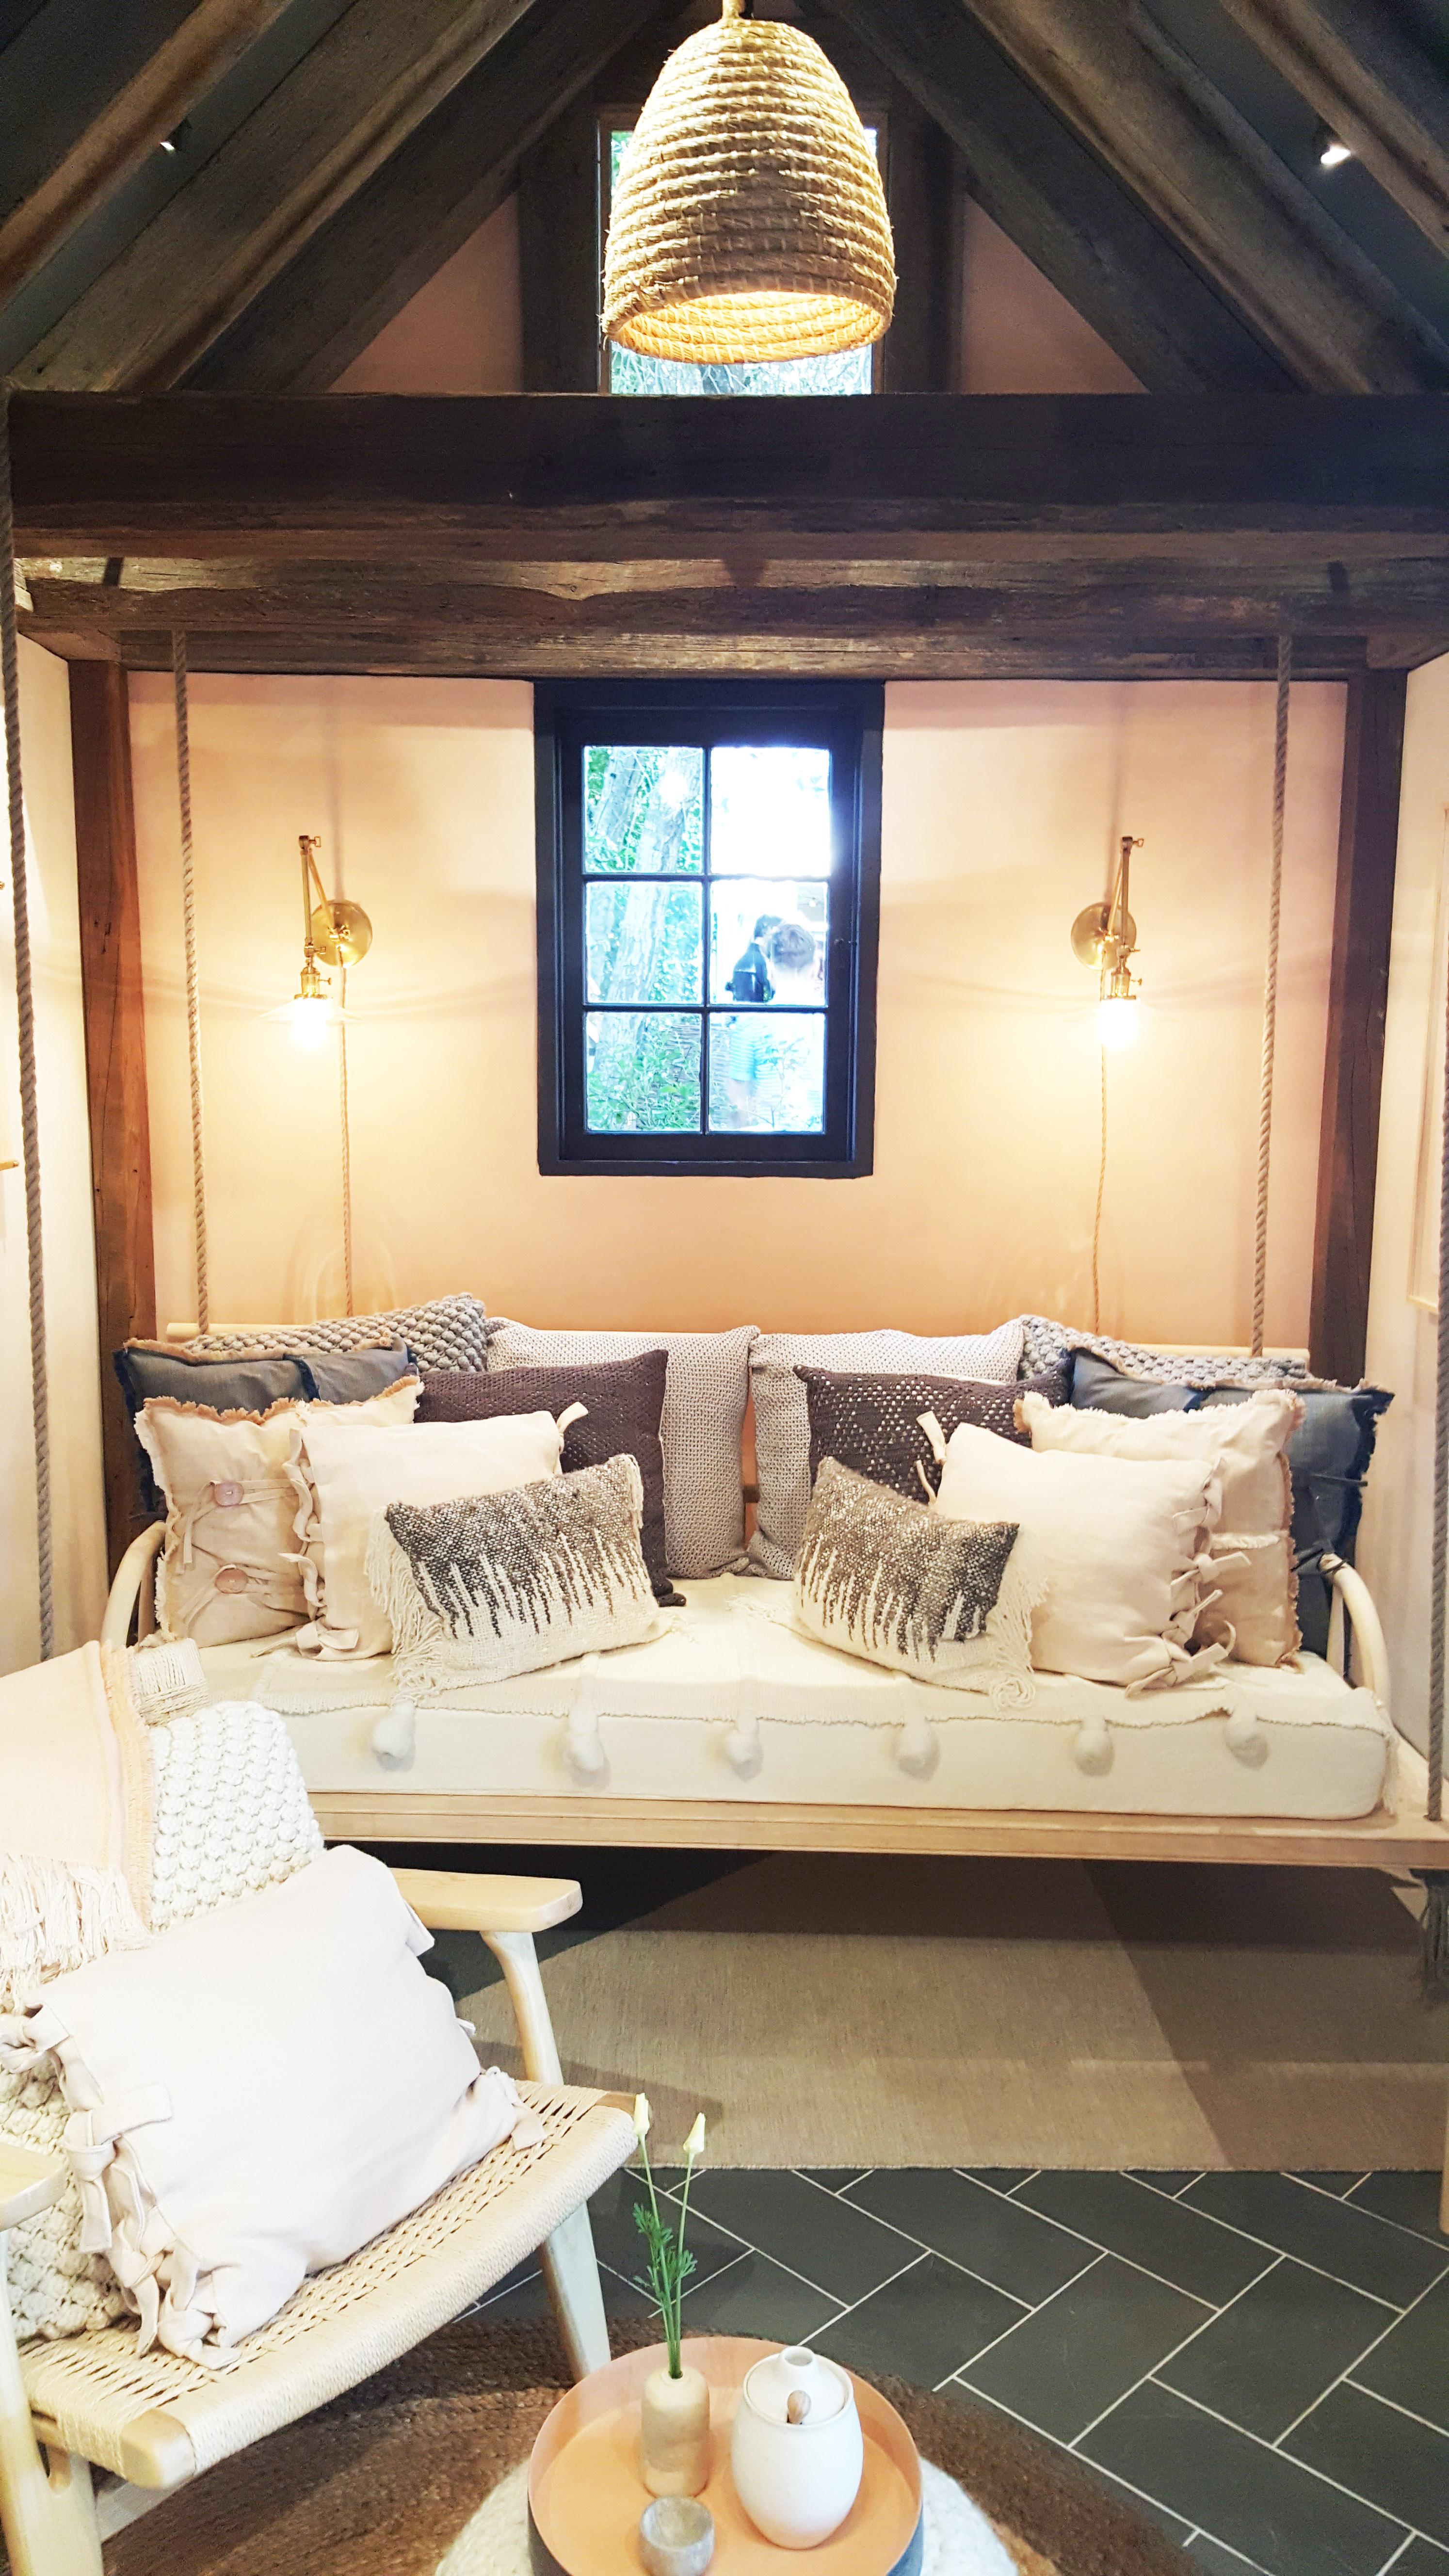 A Glimpse into the Pasadena Showcase House 2017 - LORI DENNIS